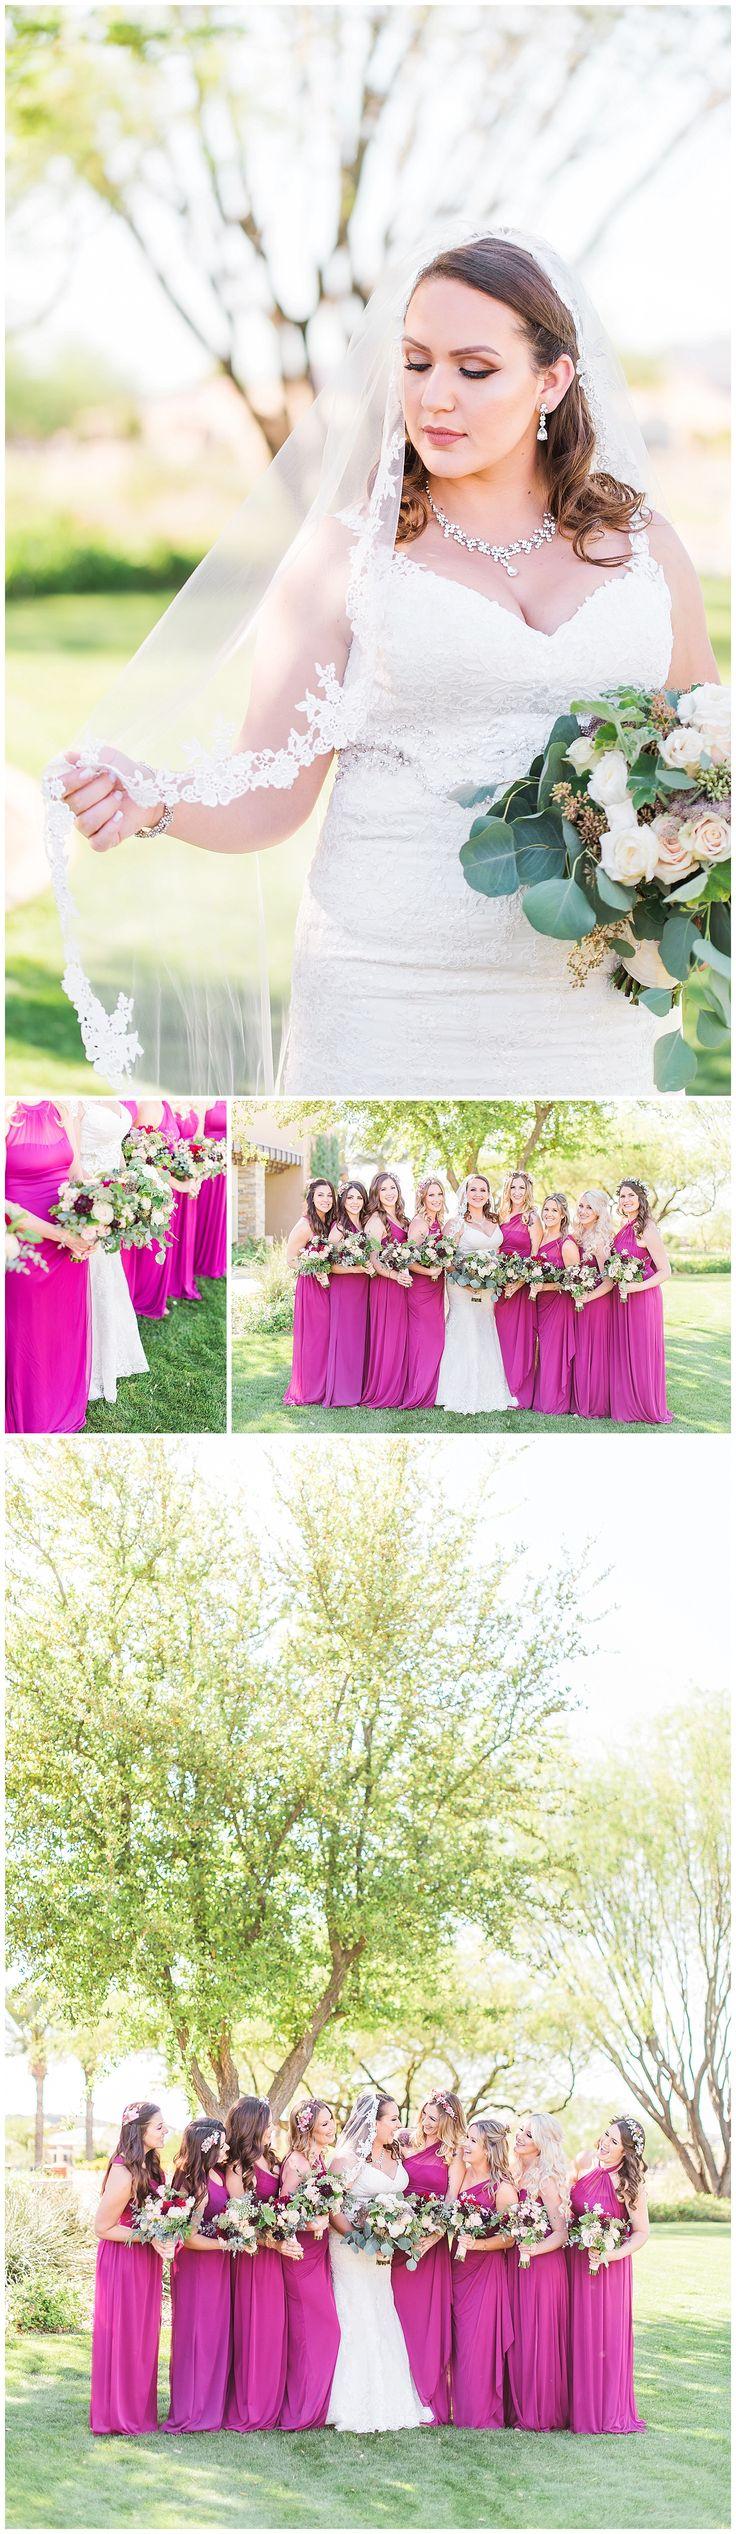 Spring Trilogy at Vistancia Wedding | Arizona Wedding Venue | Kiva Club | Pink Magenta | Bridal Portrait holding her Veil | Bouquet | Garden | Bridesmaids | Floor length Long Dresses | White Bridal Gown with Straps | Drew Brashler Photography